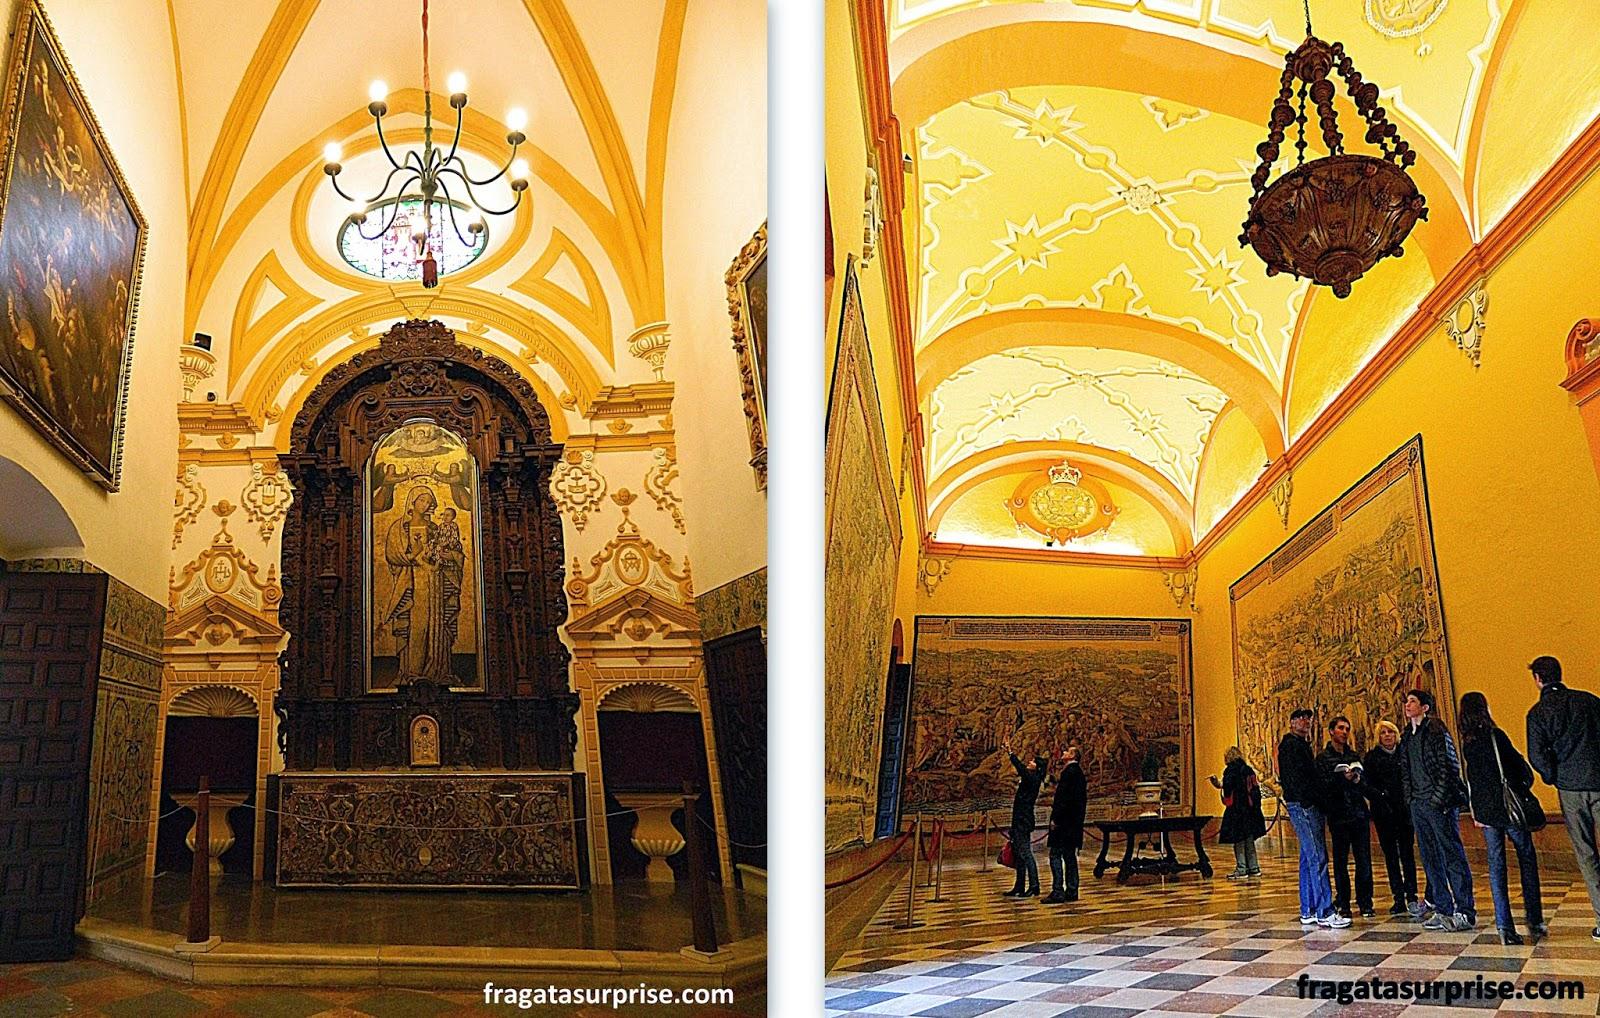 Tapeçarias flamengas no Real Alcázar de Sevilha